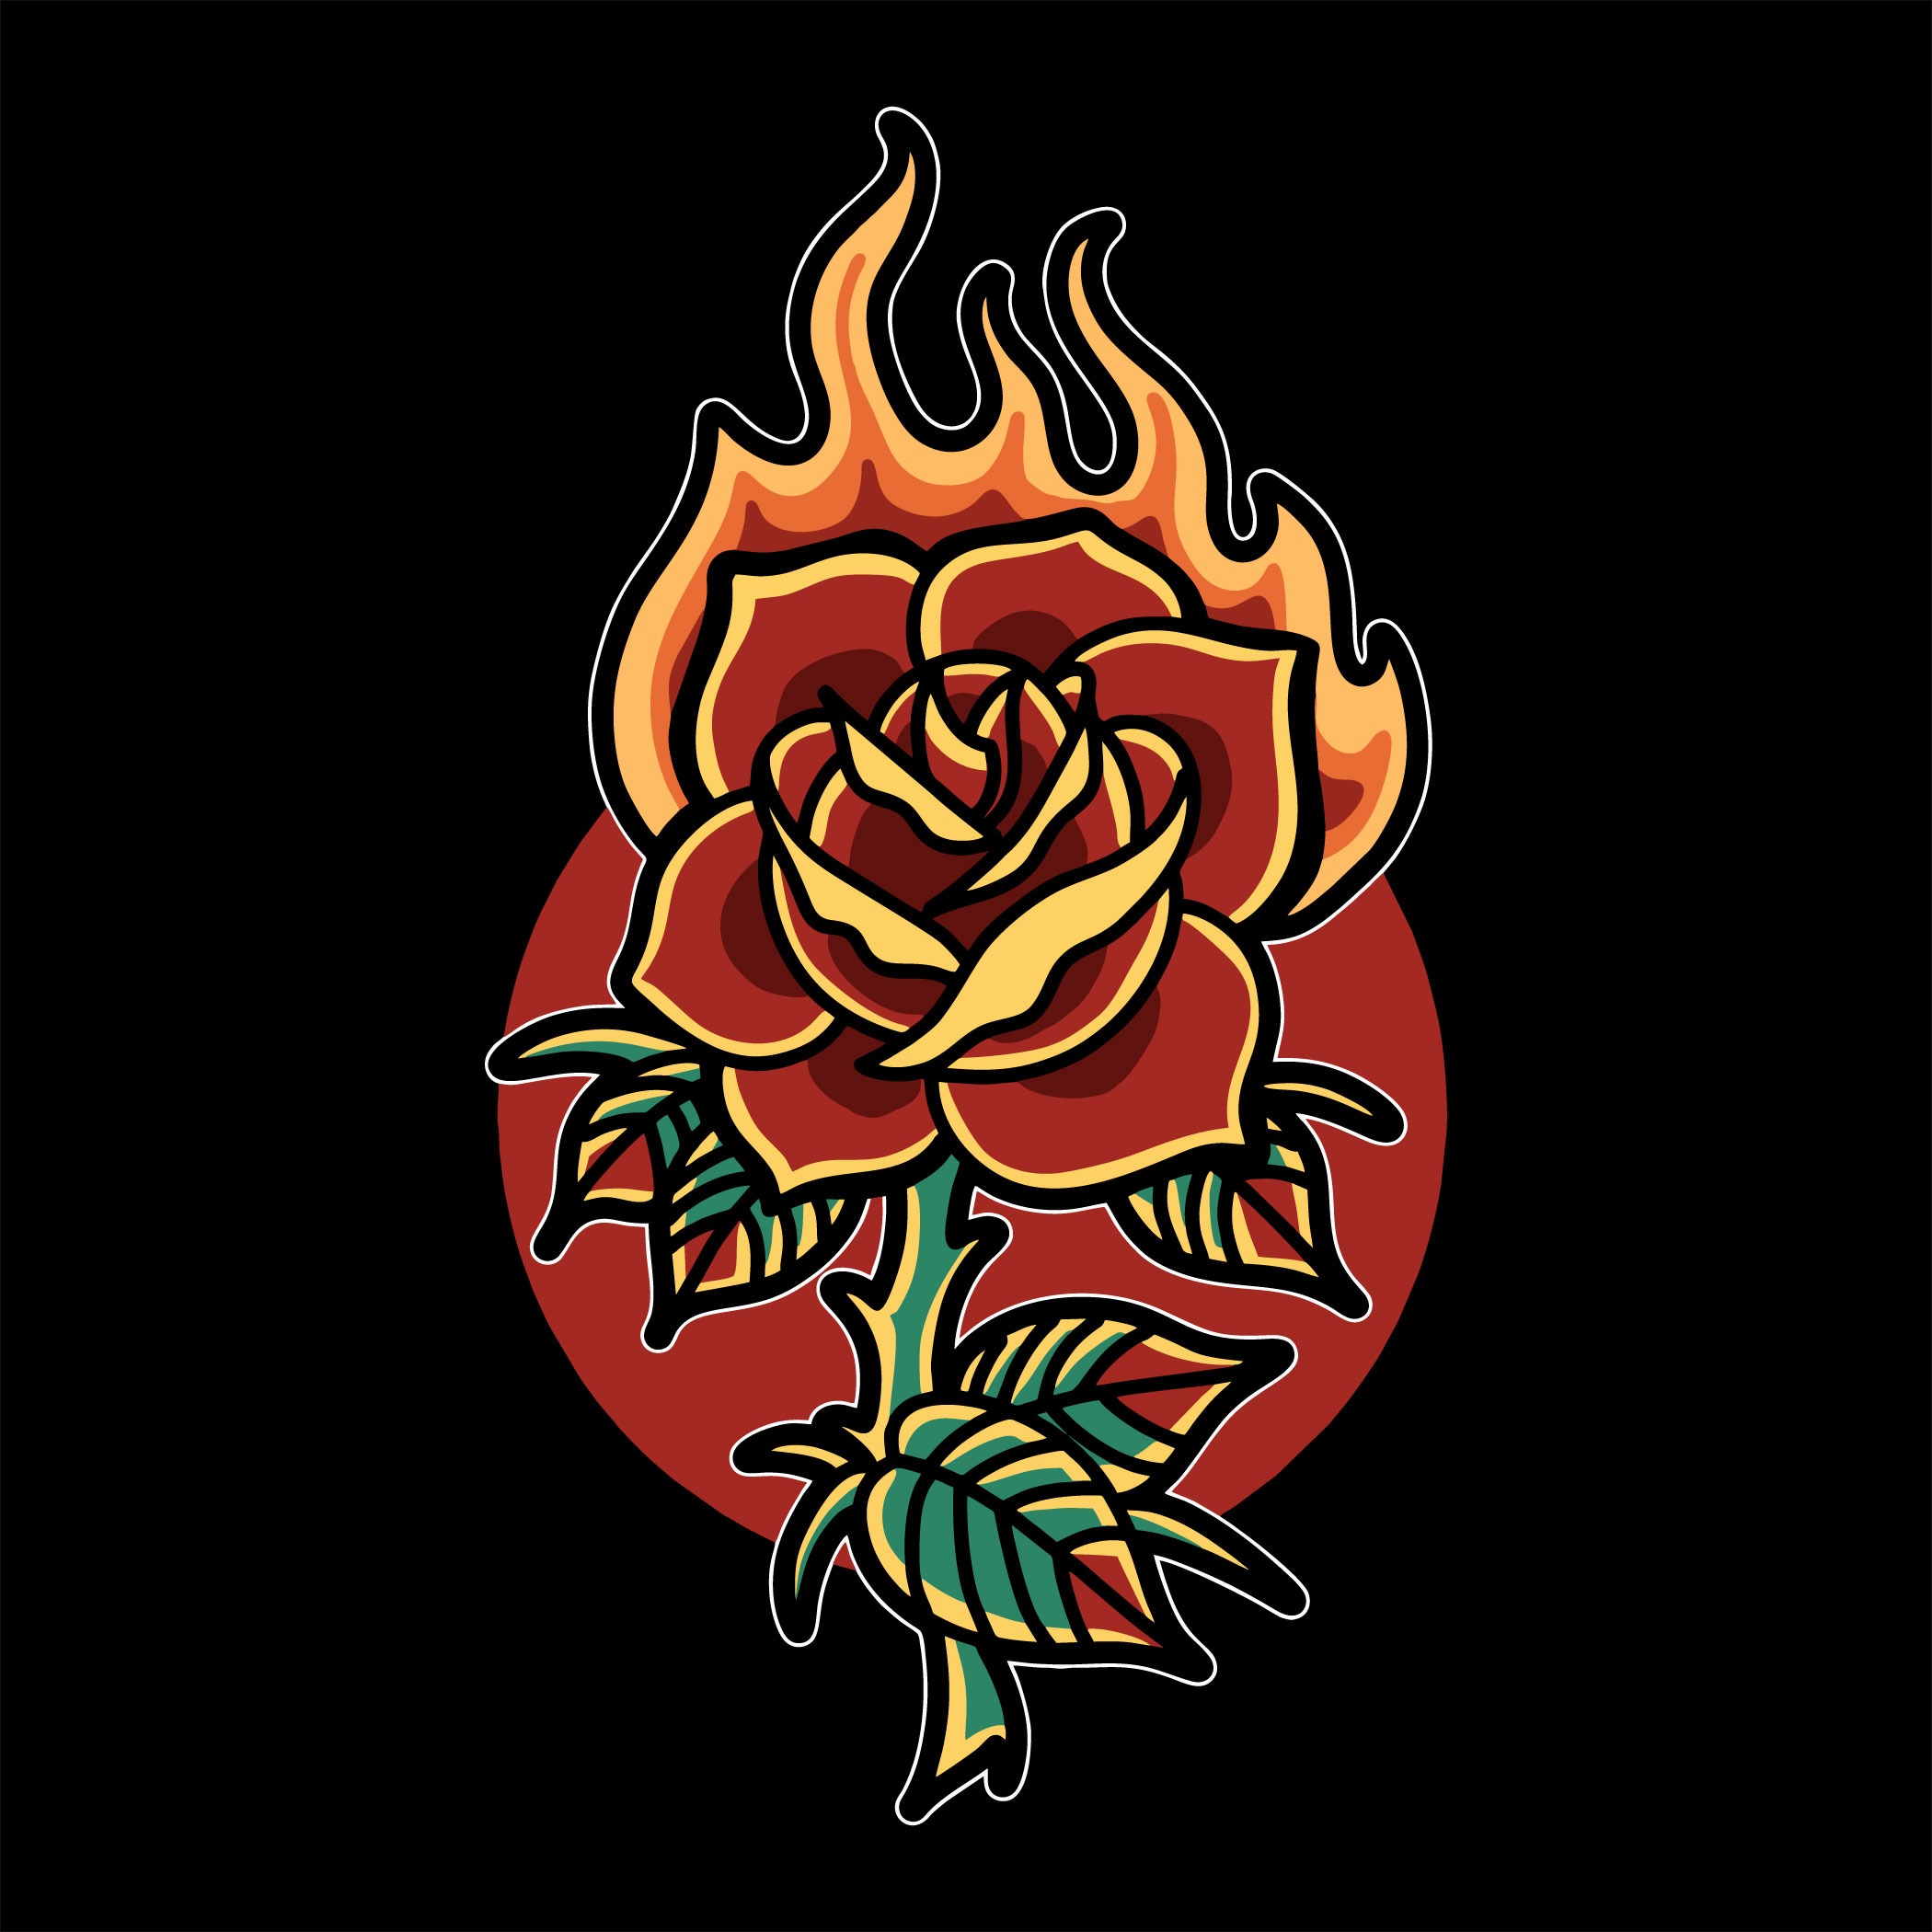 Burning rose tattoo